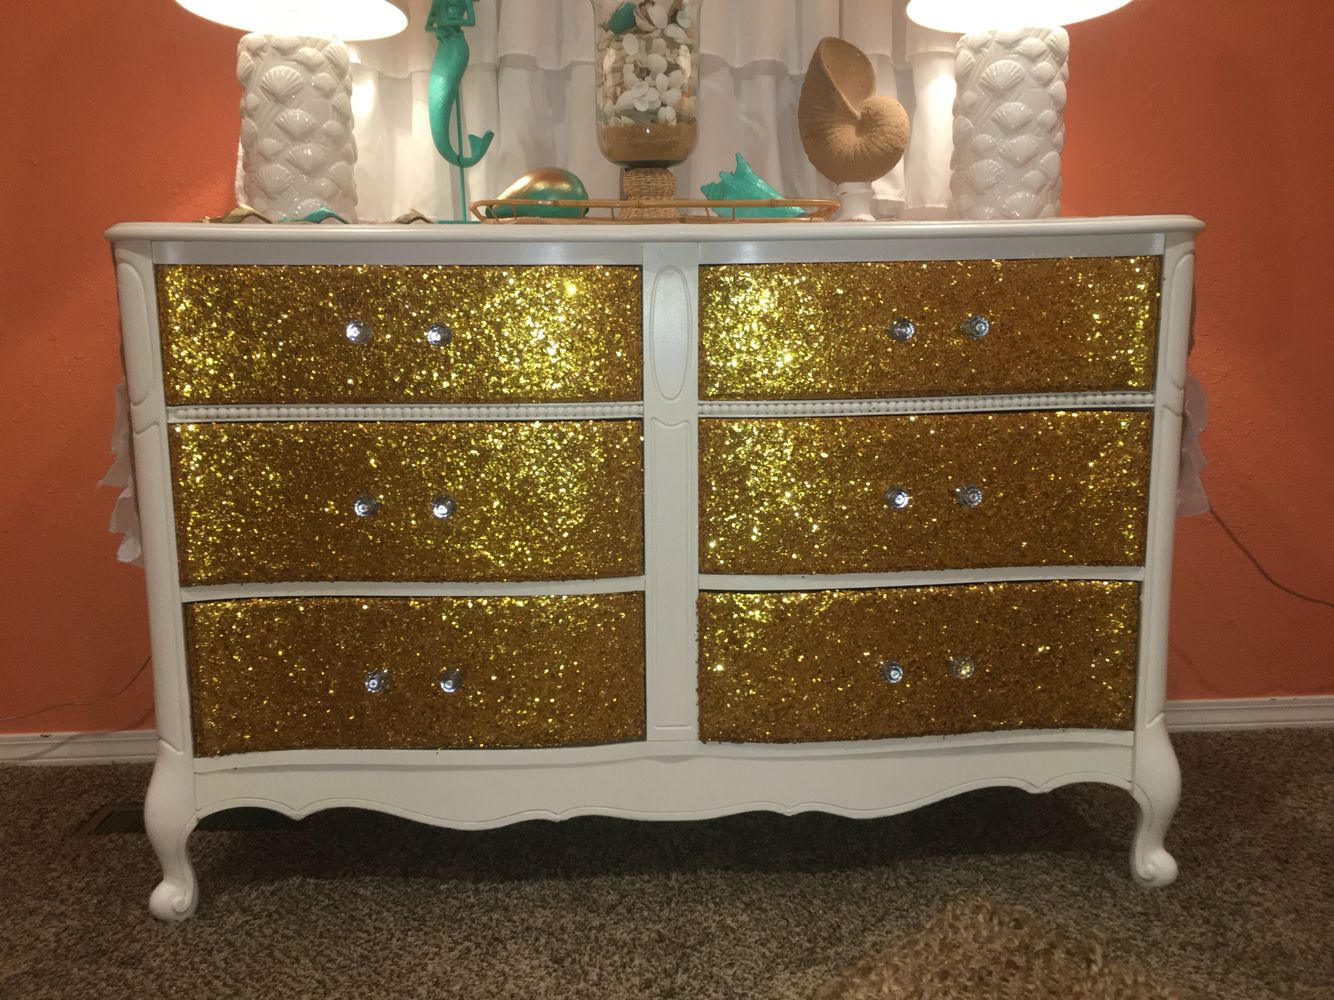 Diy projects for bedroom pinterest diy glitter dresser u  dresser redo  pinterest  dresser room and